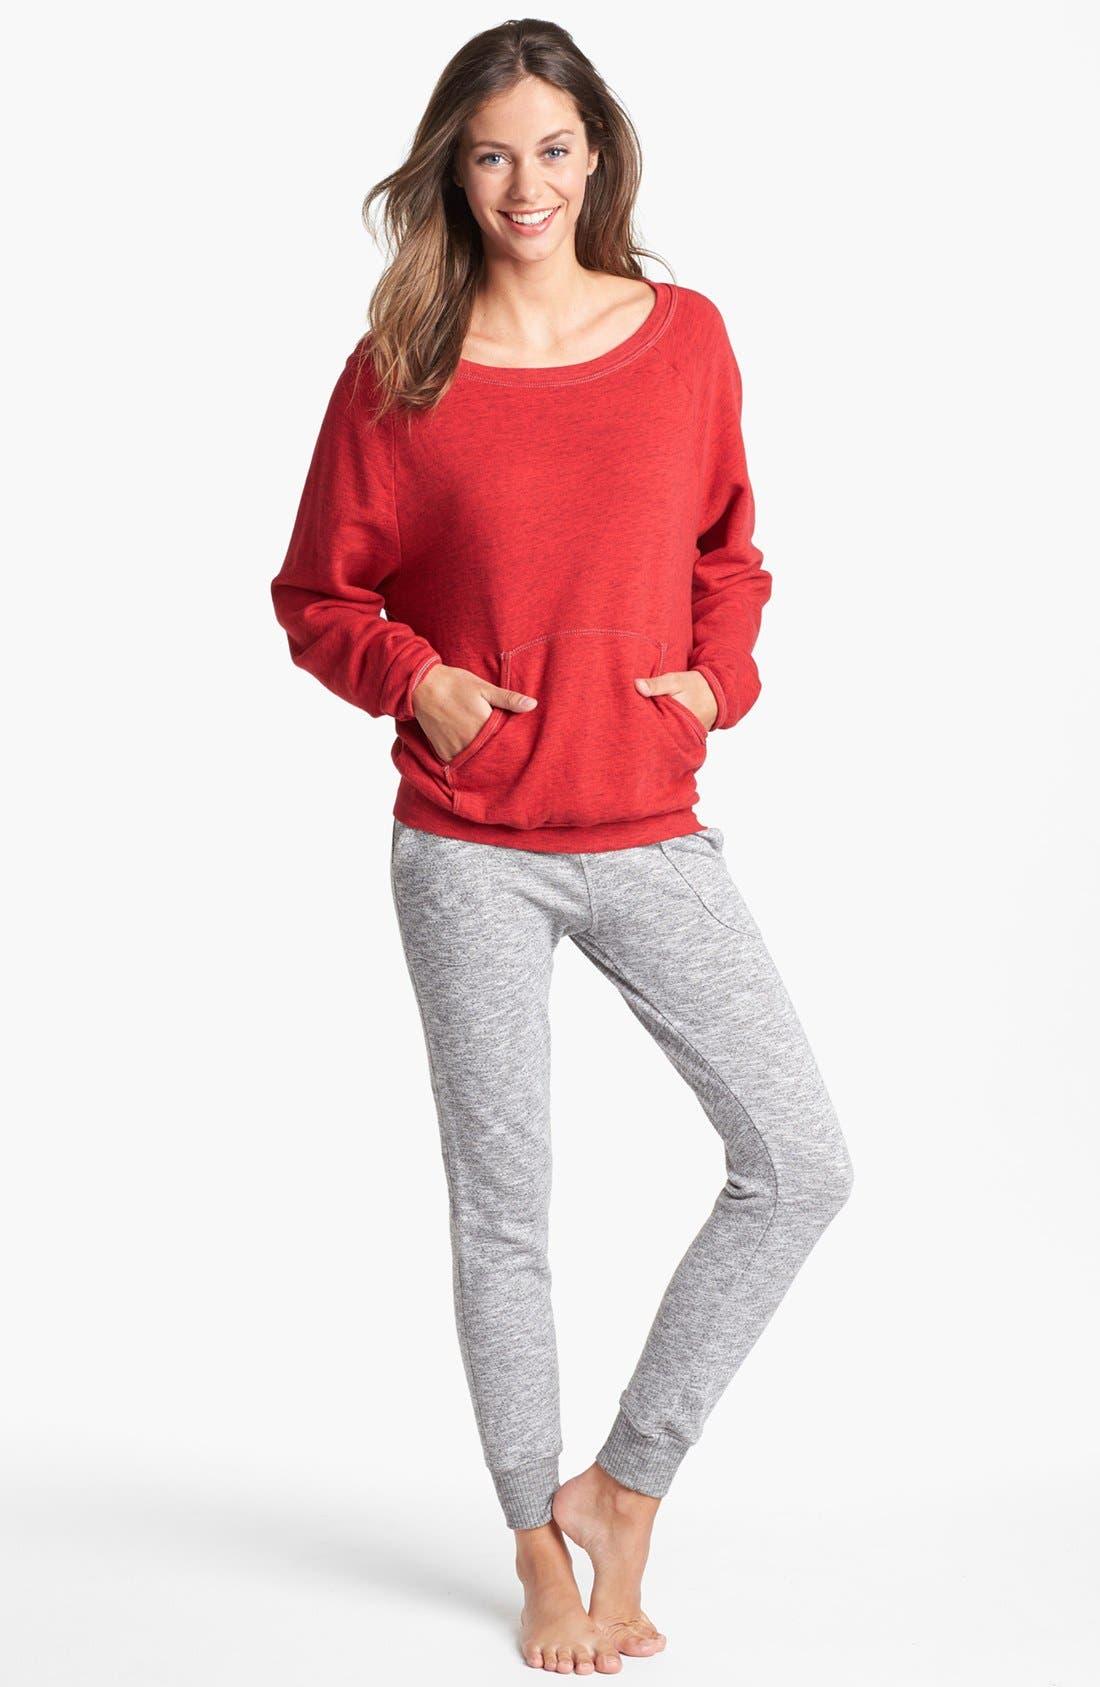 Main Image - Hard Tail Sweatshirt & Ankle Pants